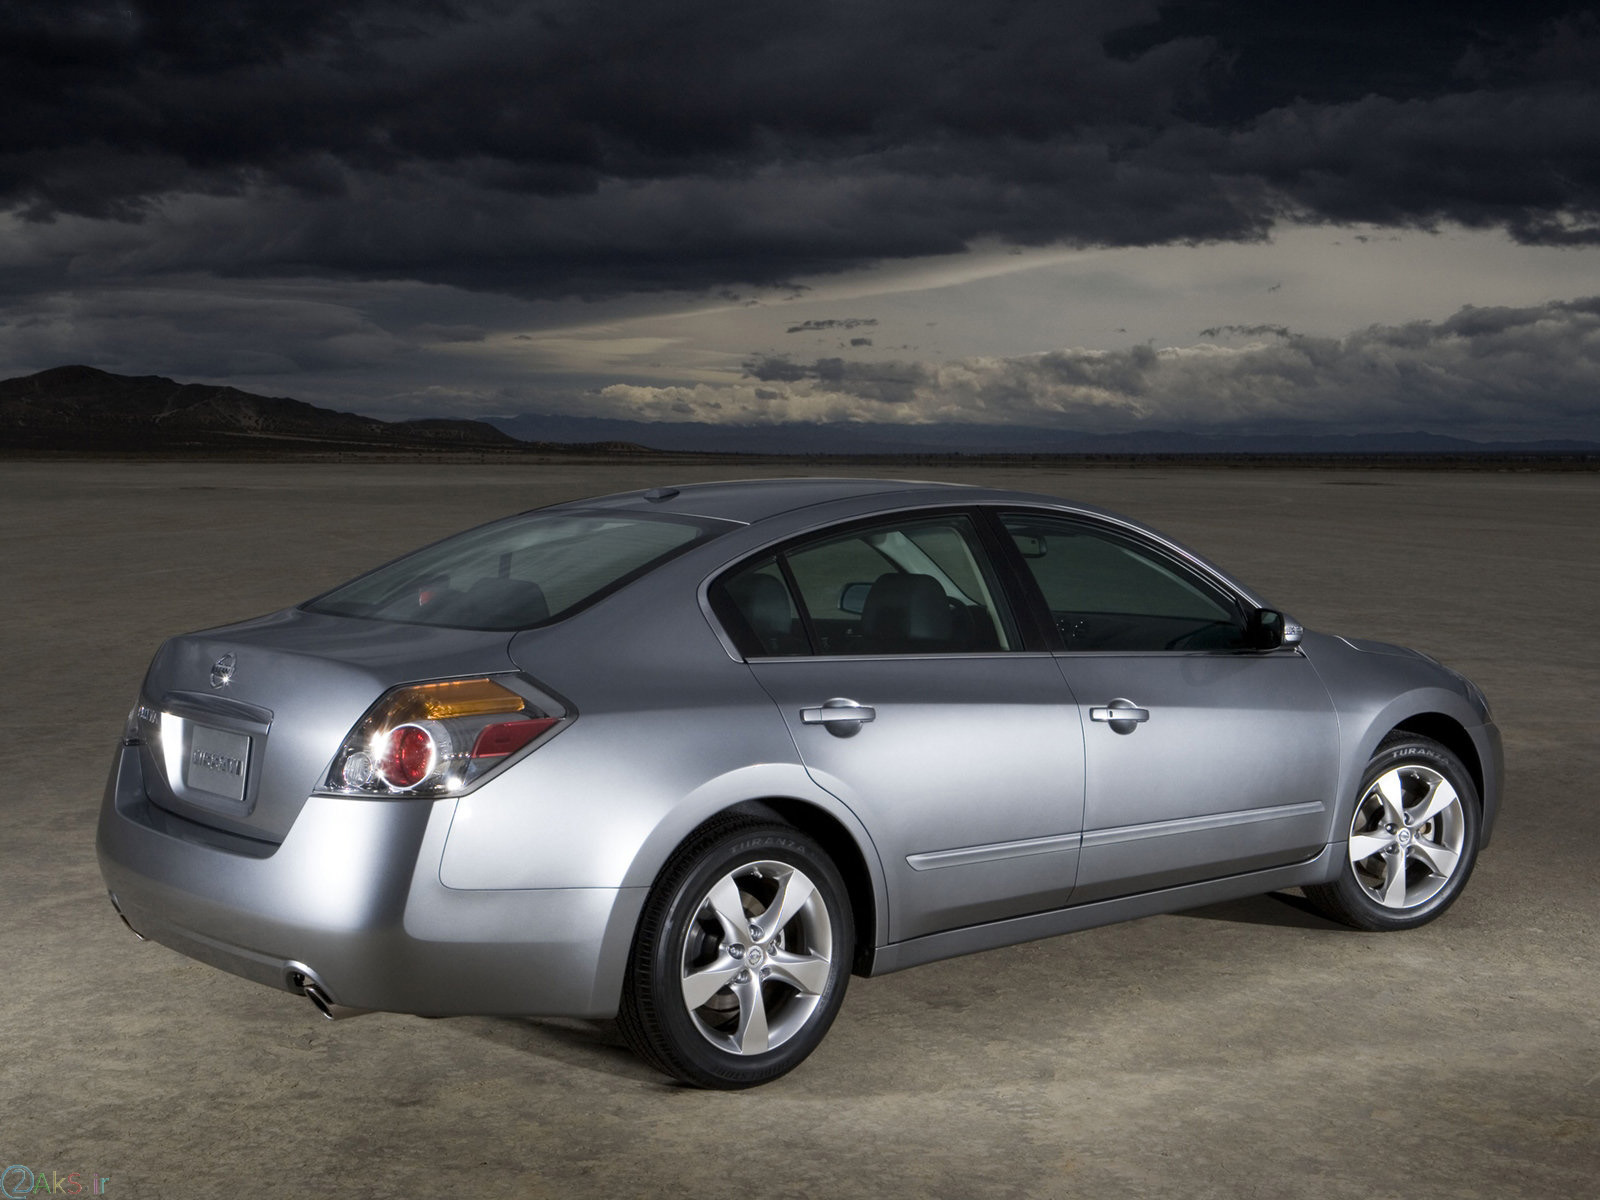 jwh,dv Nissan Altima